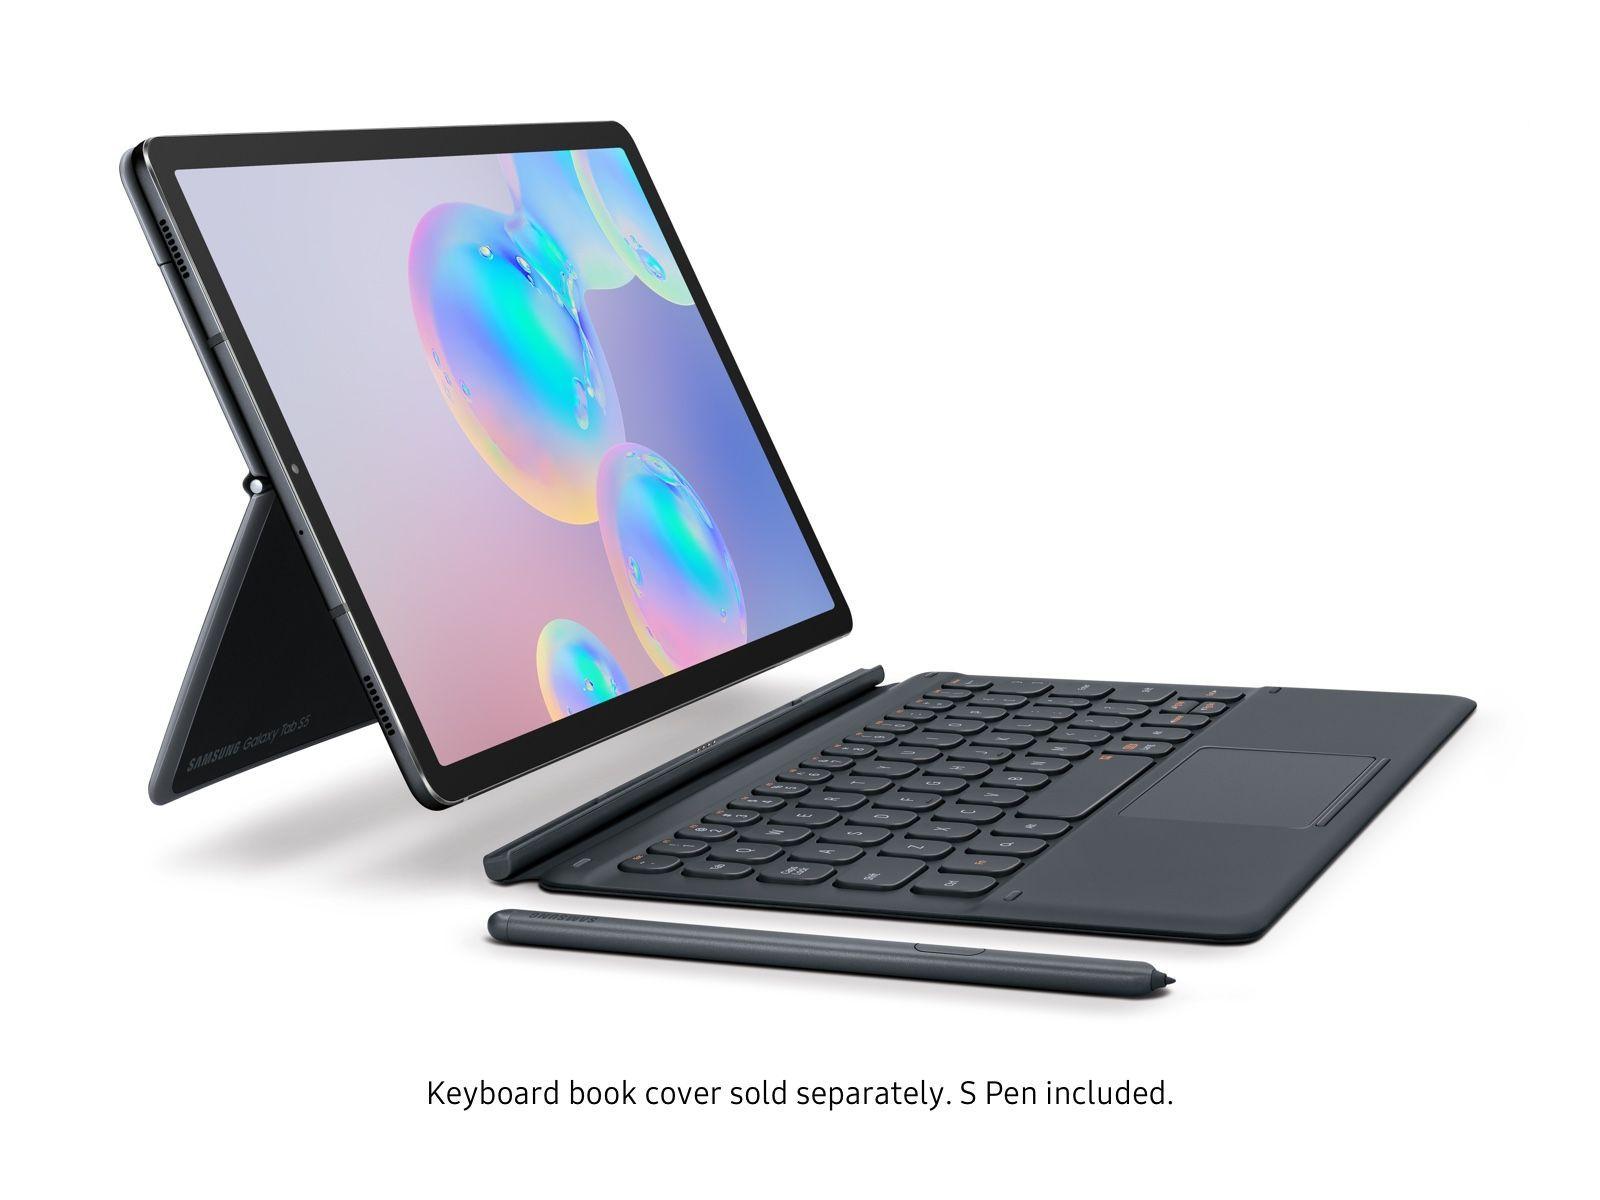 Galaxy Tab S6 10 5 128gb Cloud Blue Wi Fi S Pen Included